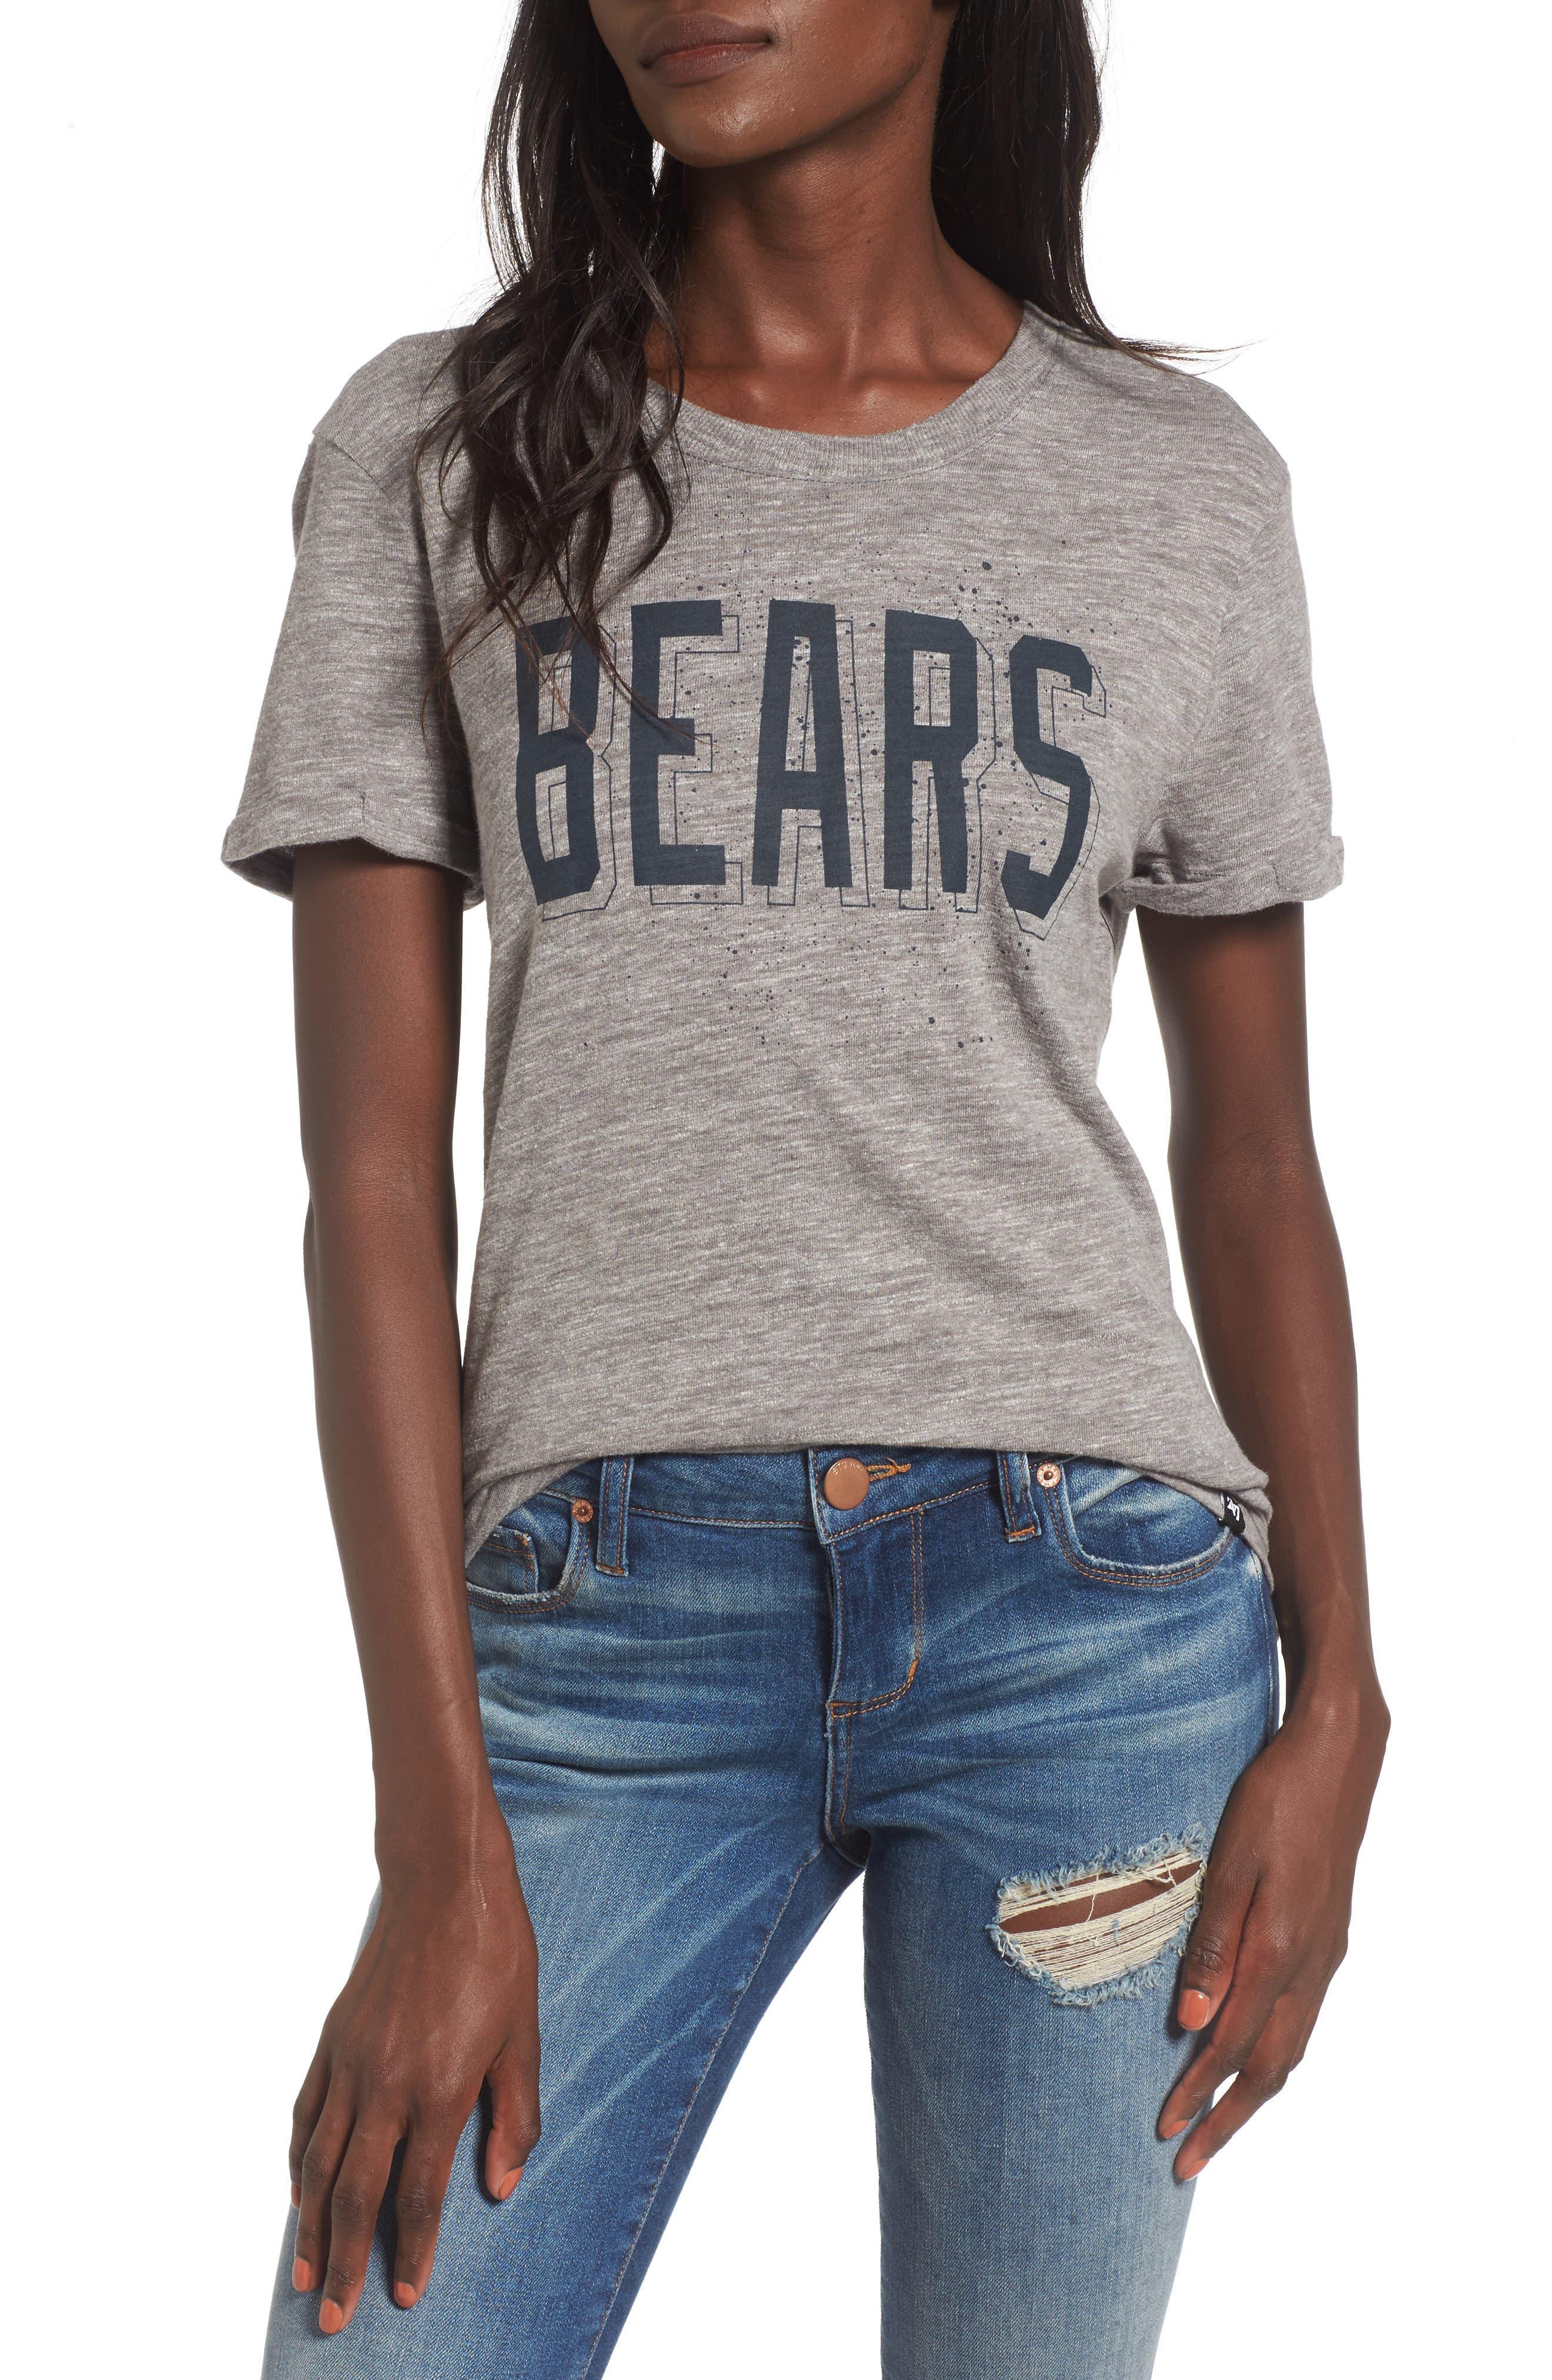 MVP Hero - Chicago Bears Tee,                             Main thumbnail 1, color,                             Vintage Grey